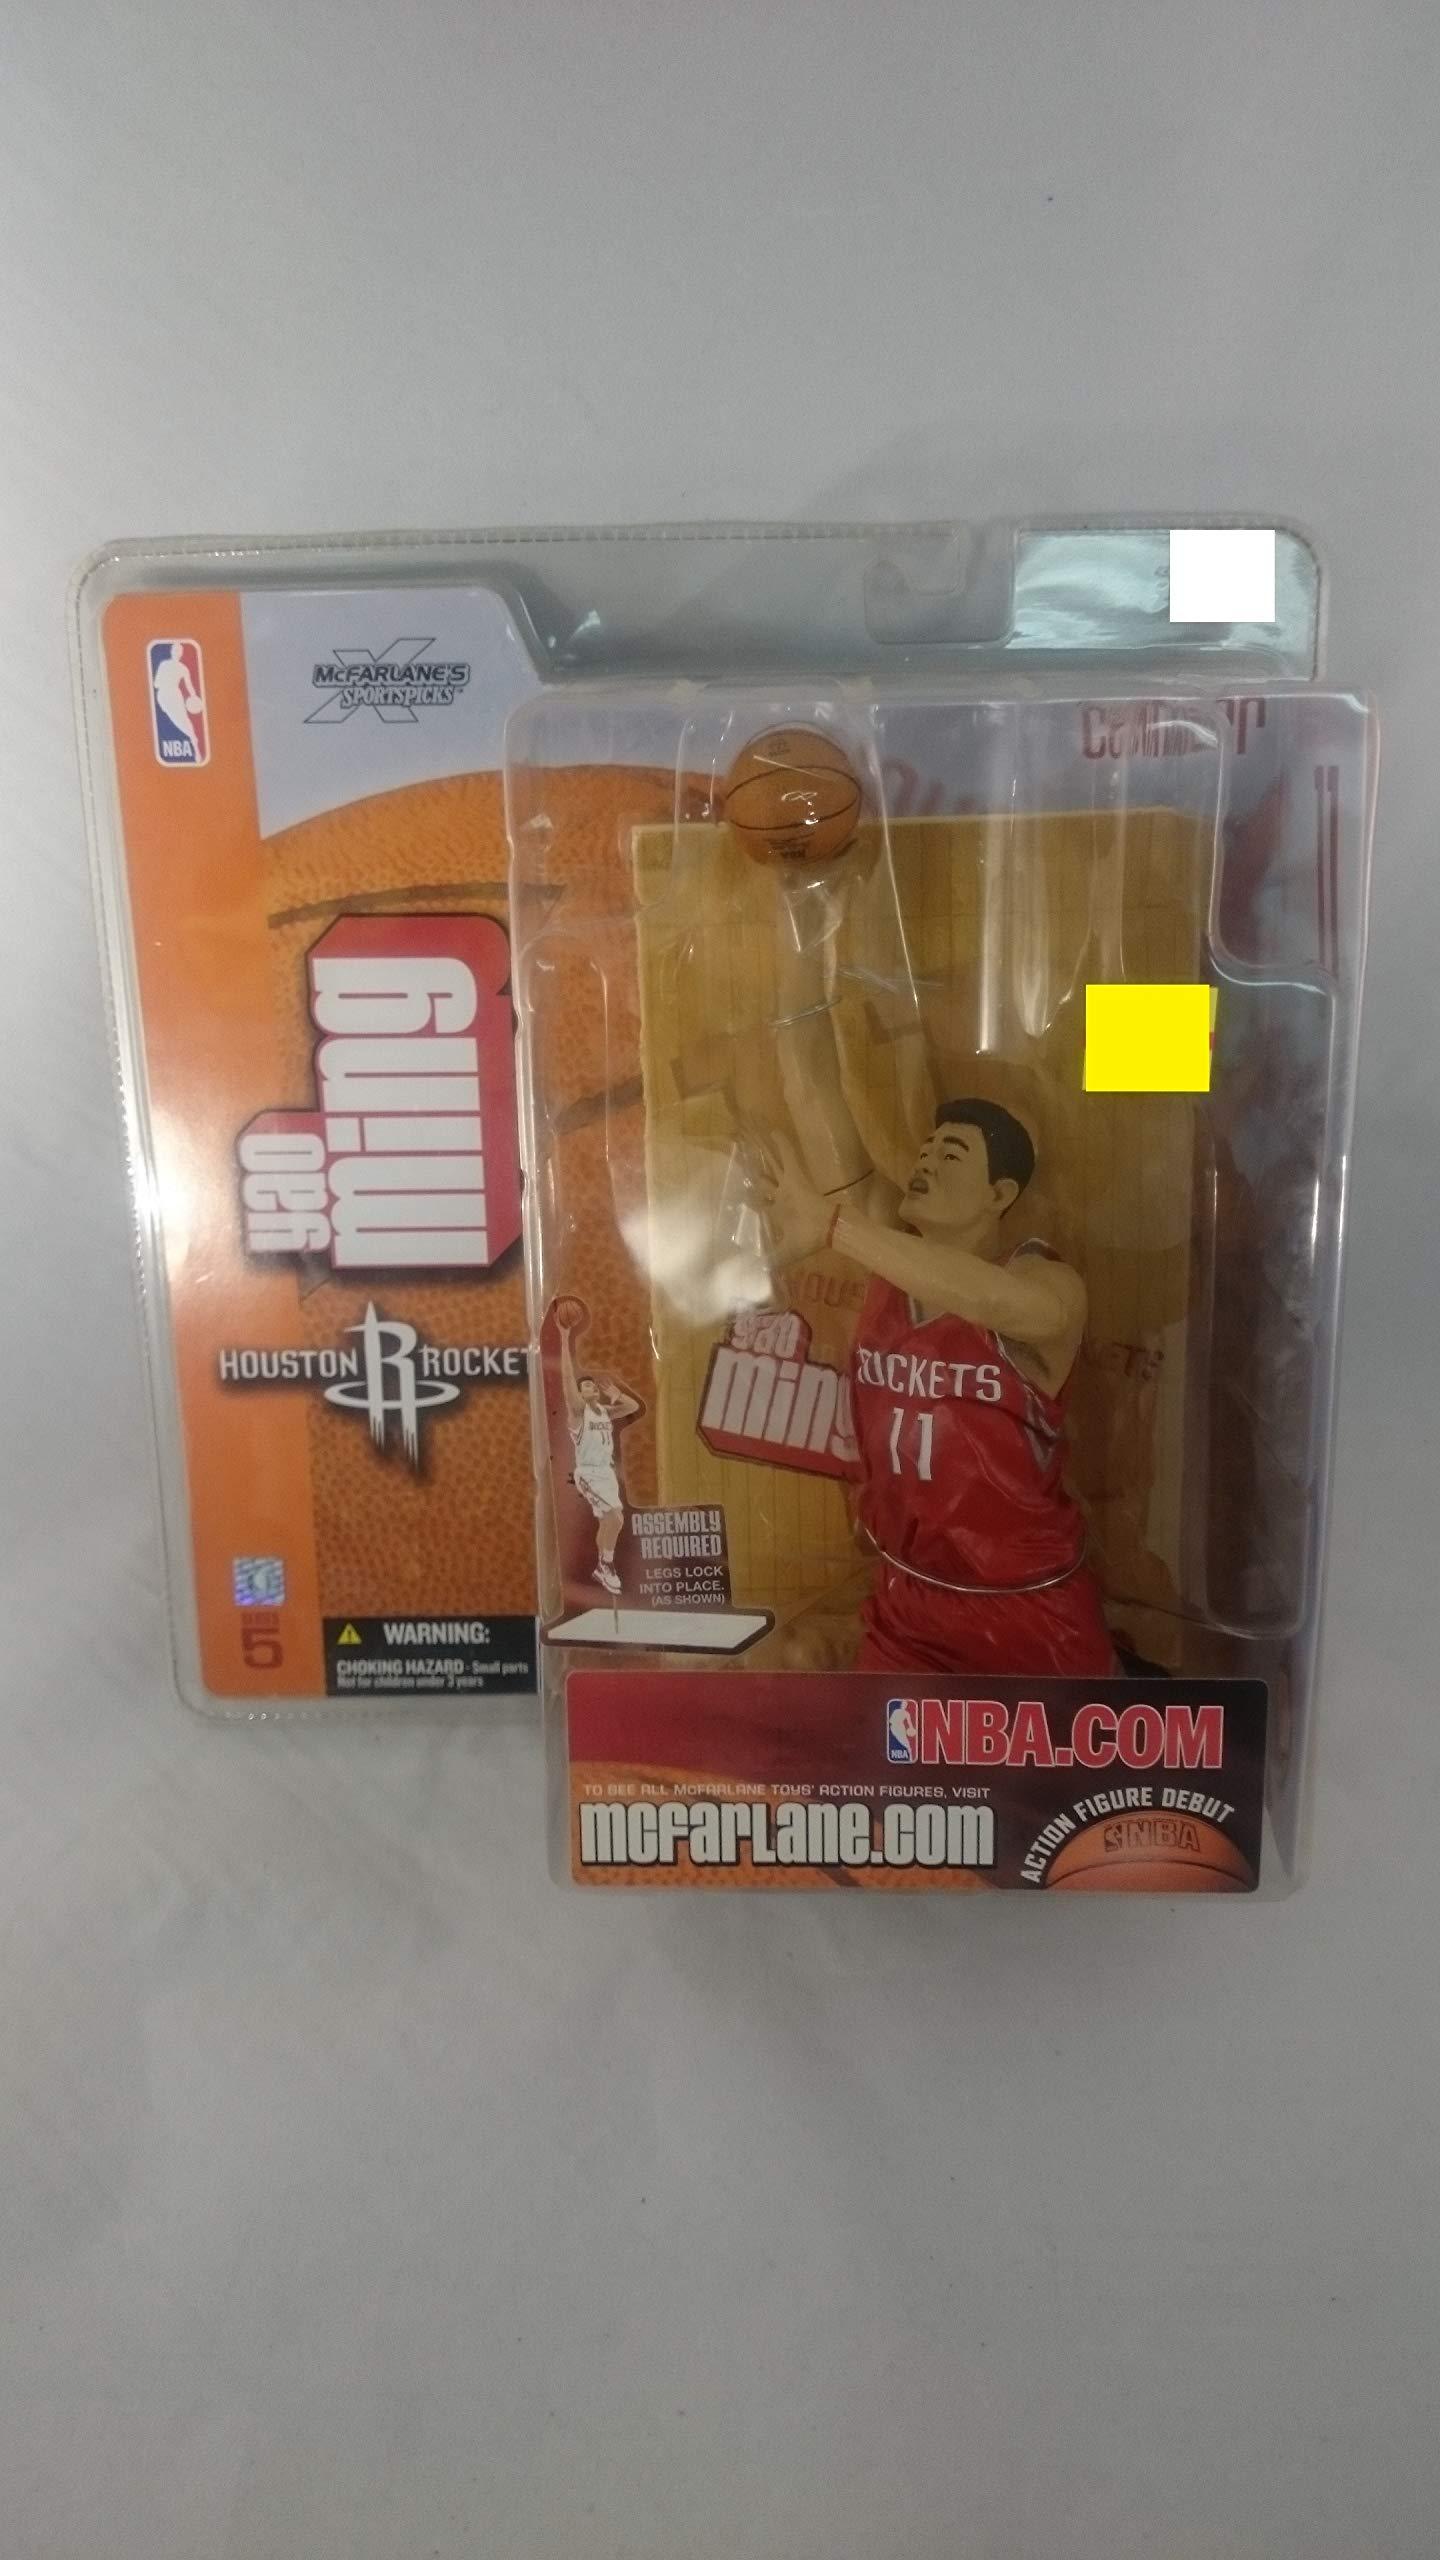 2003 Yao Ming McFarlane Action Figure Debut NBA Series 5 Houston Rockets Variant